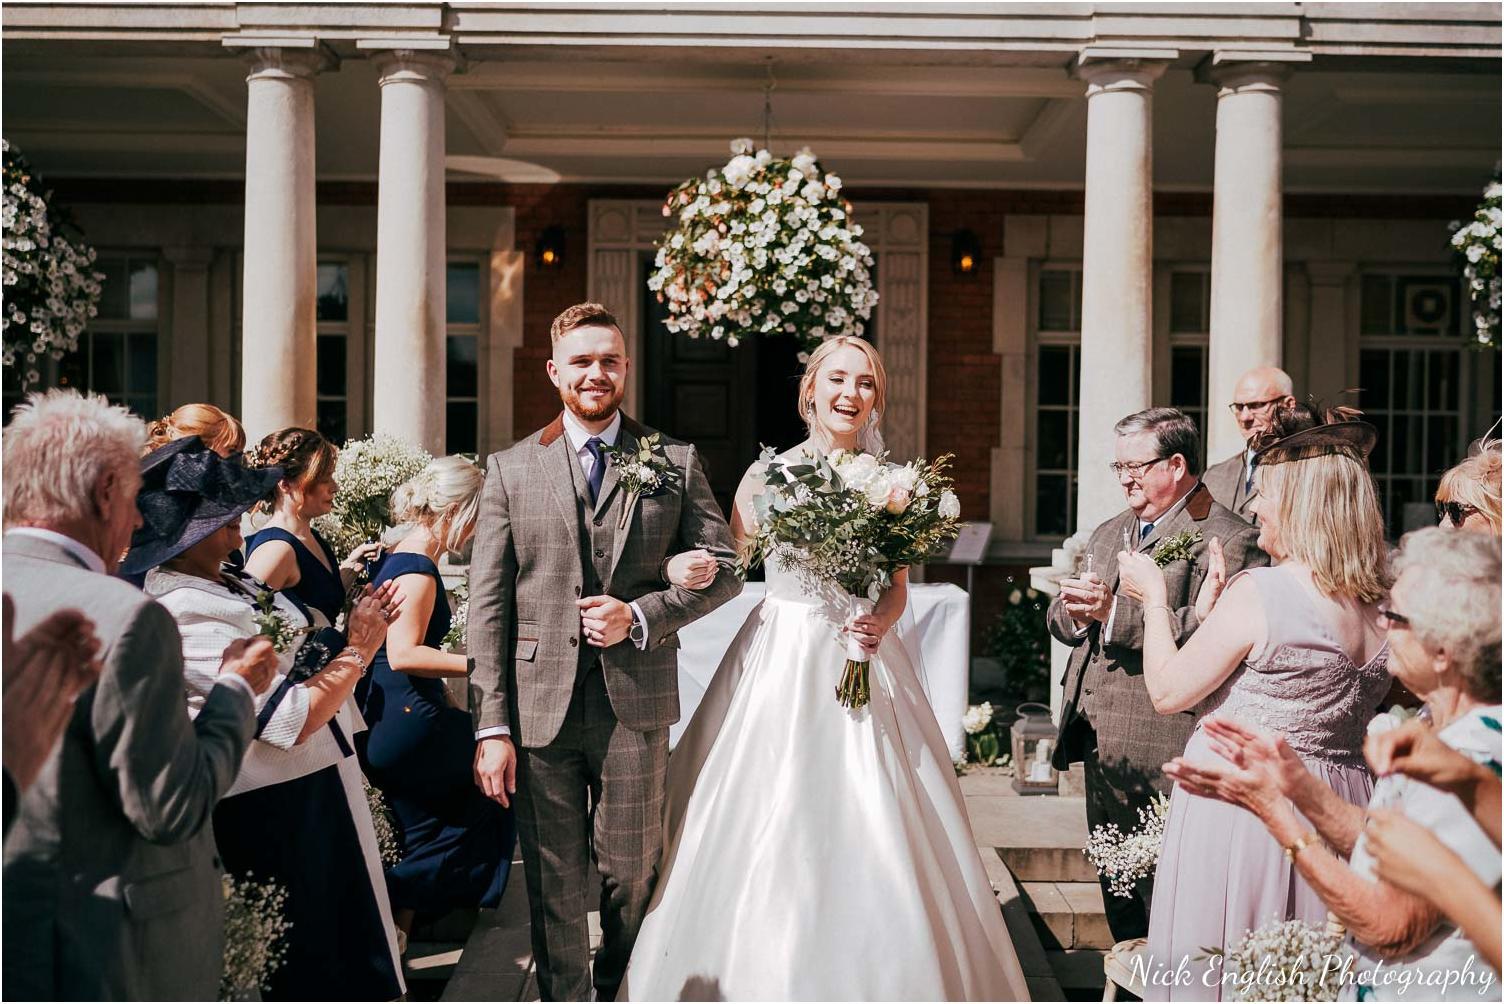 Eaves_Hall_Outdoor_Wedding_Photograph-40.jpg